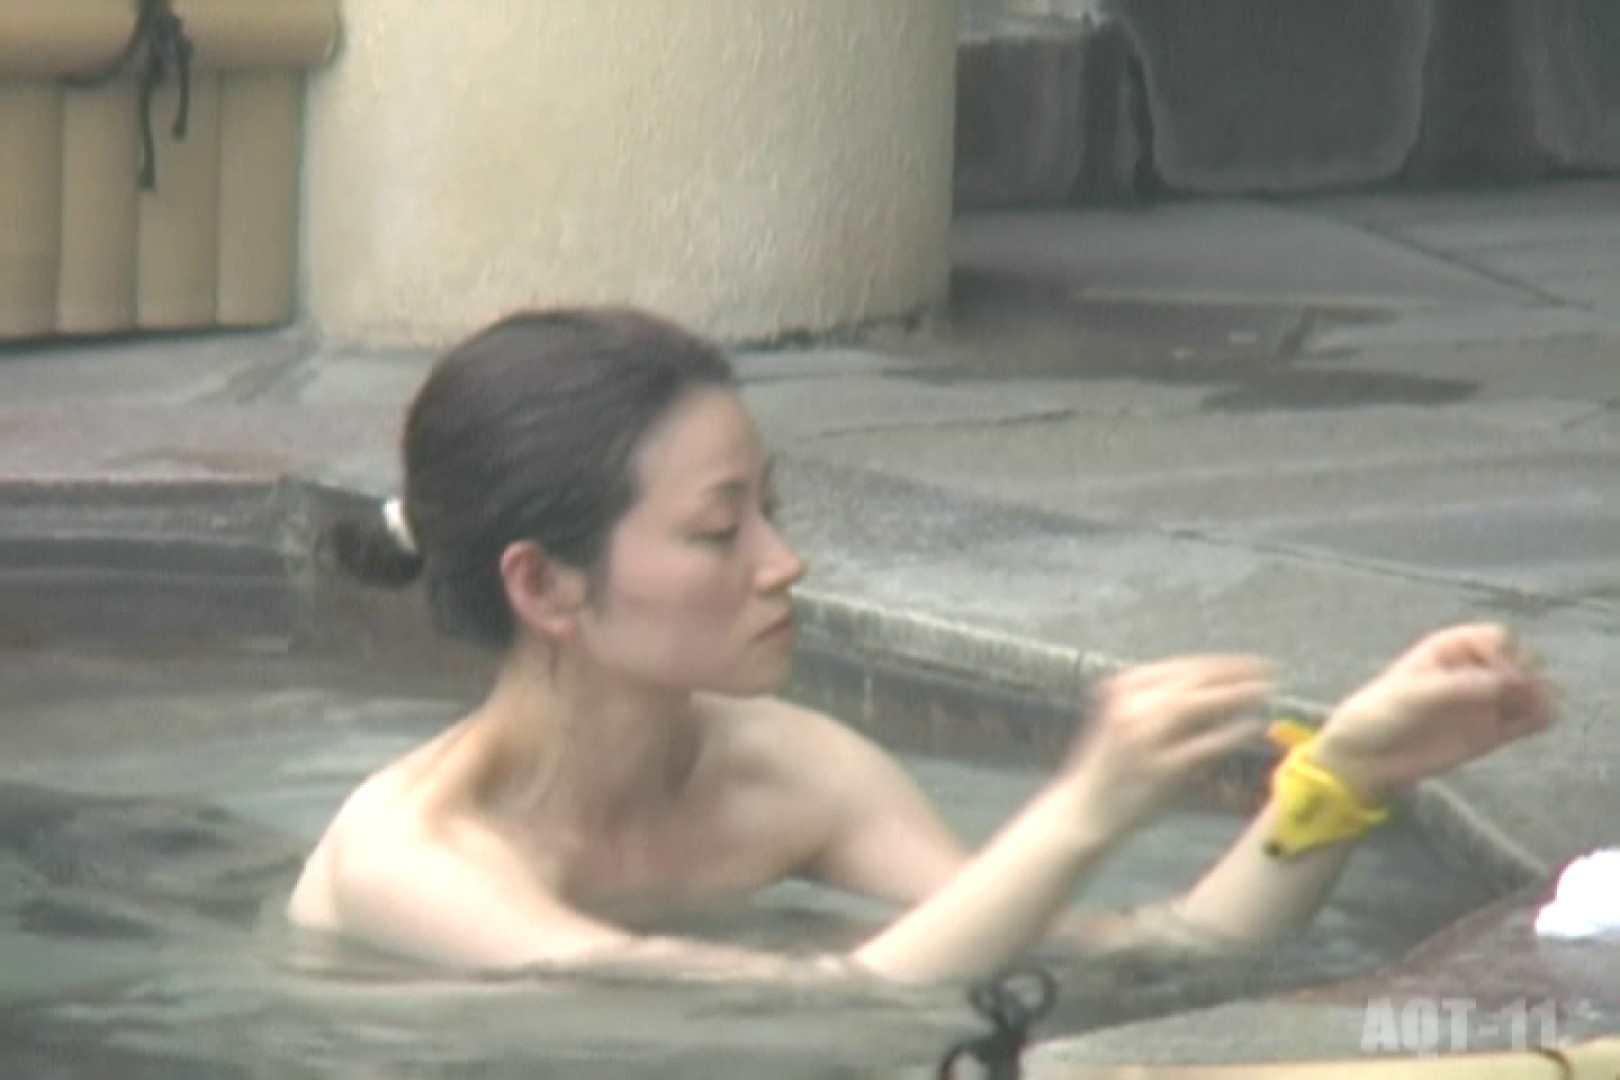 Aquaな露天風呂Vol.802 OLのプライベート   盗撮特撮  11pic 1